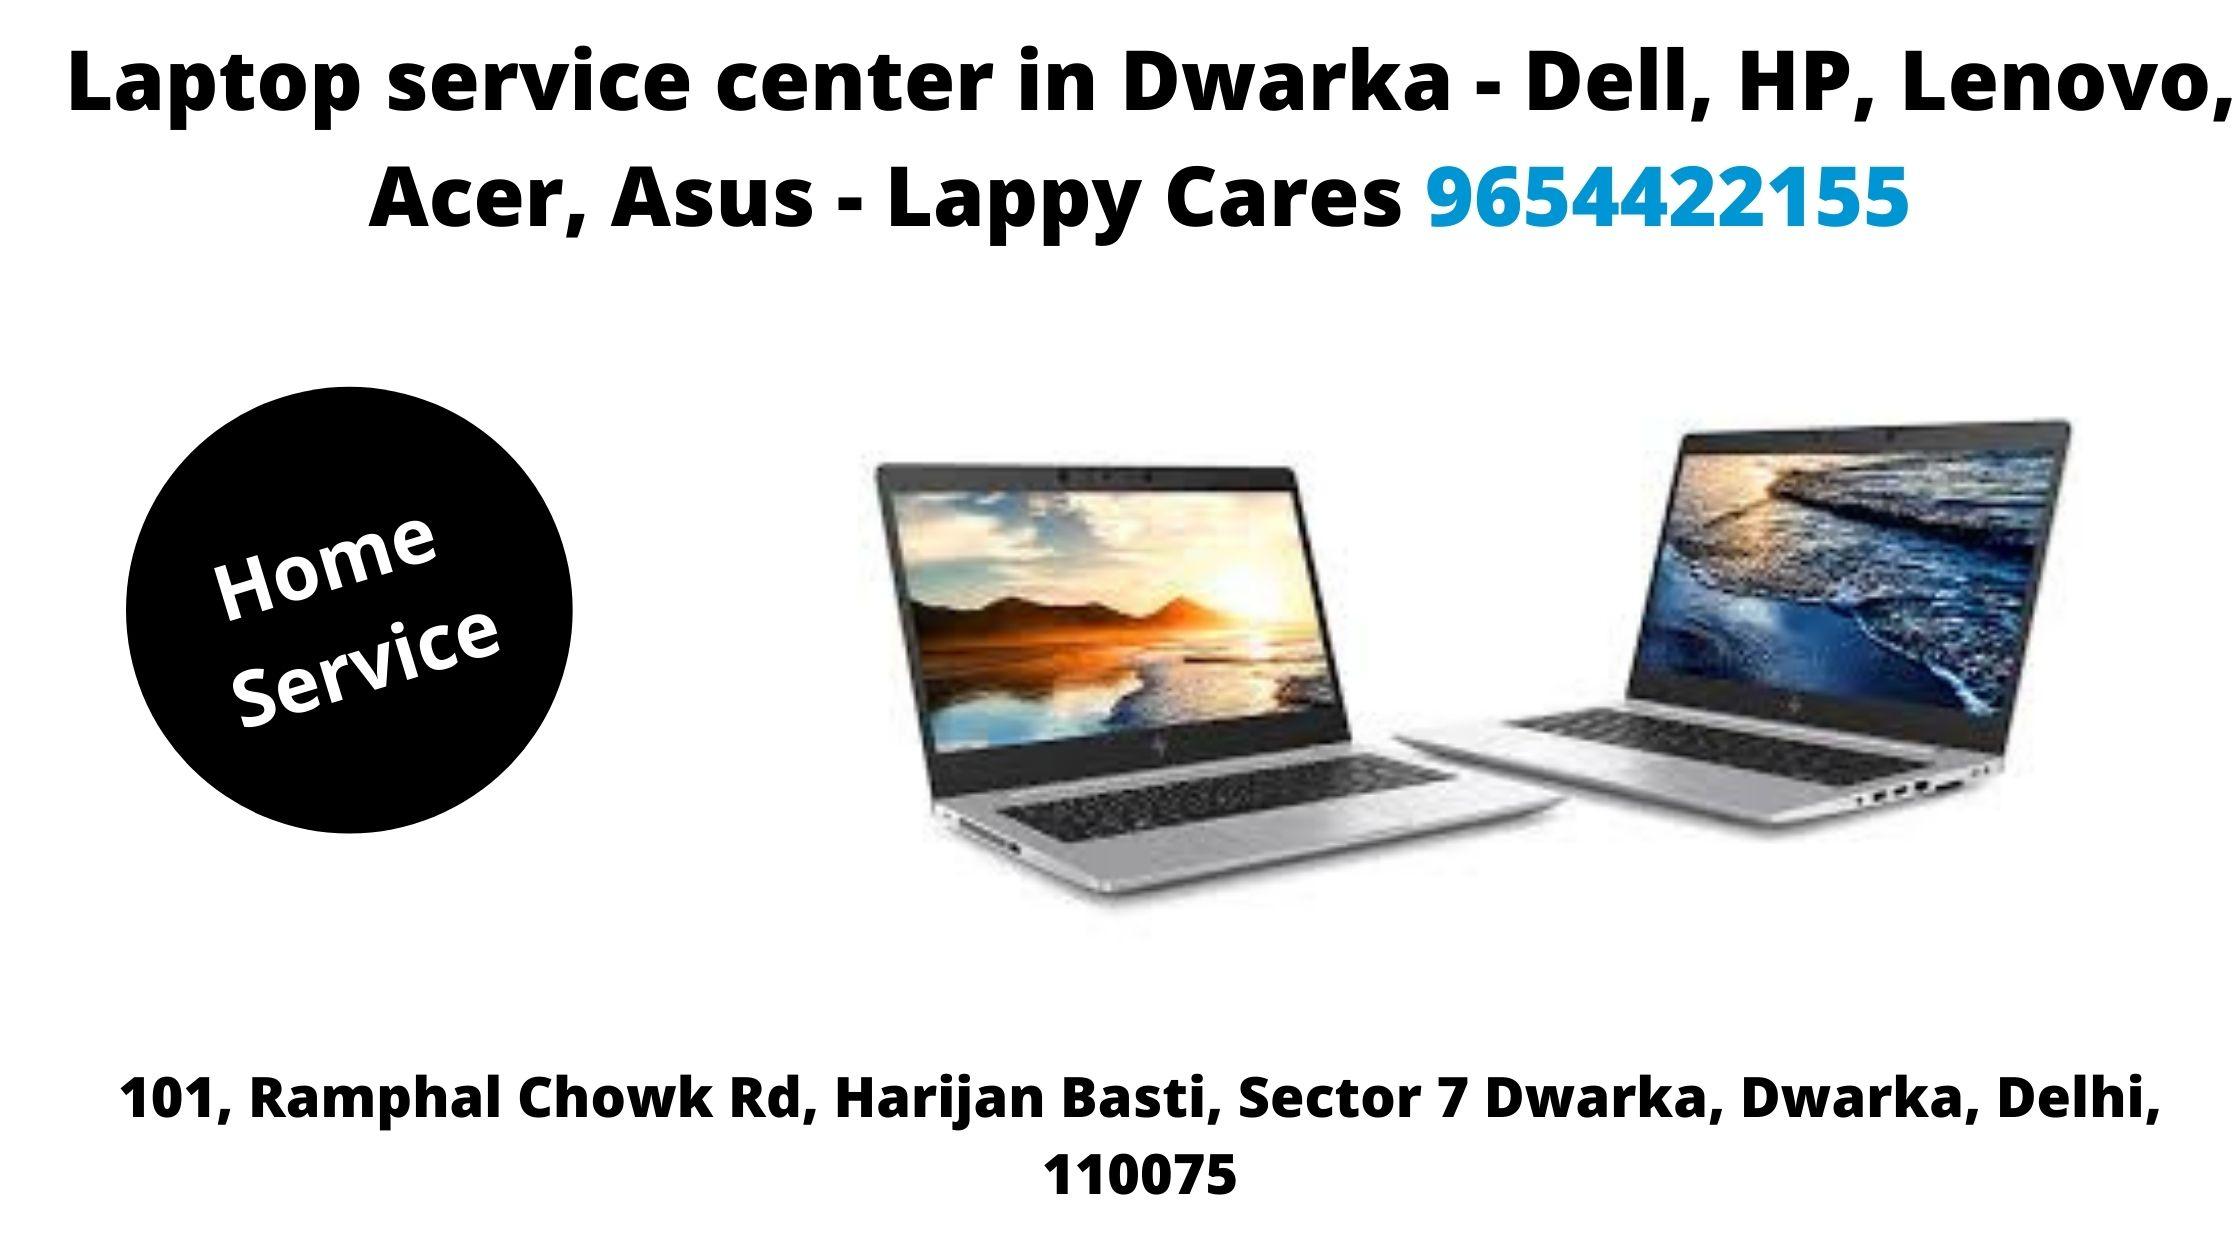 dell laptop service center in dwarka dell hp